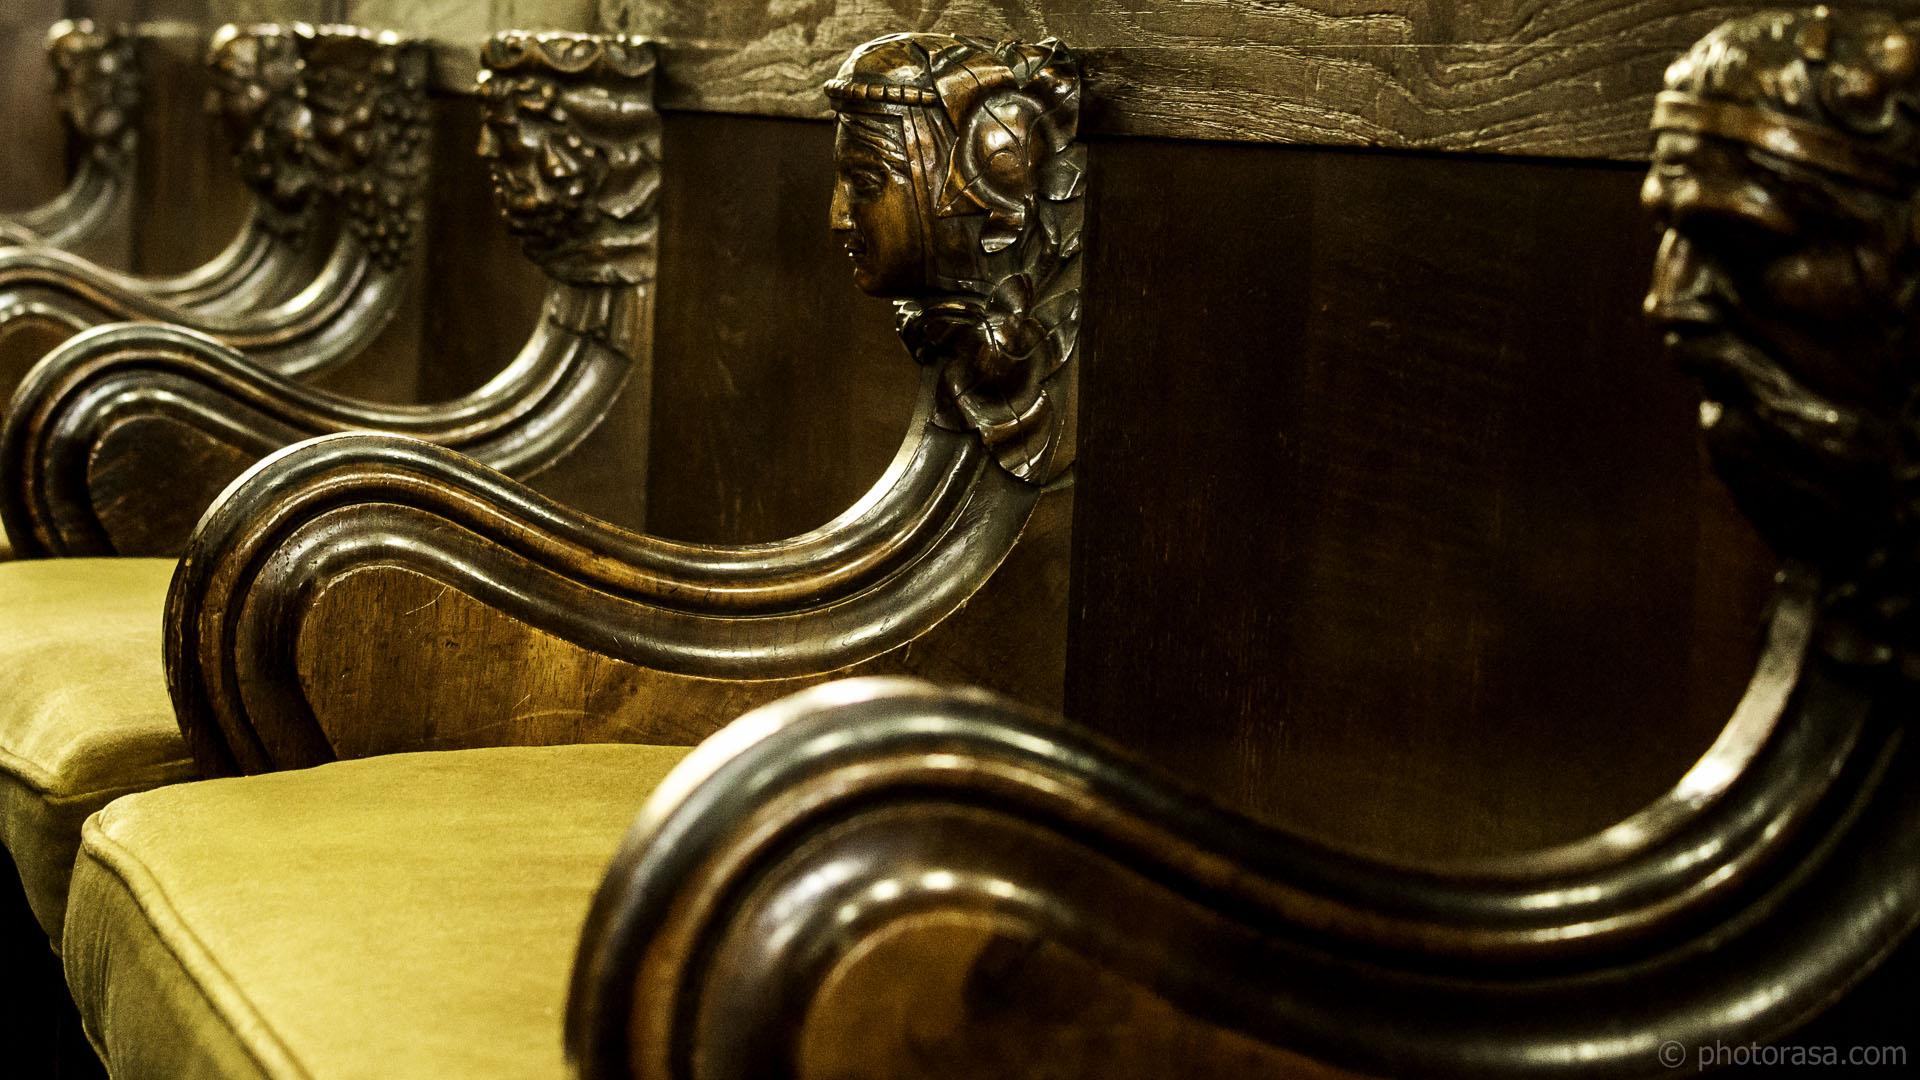 https://photorasa.com/inside-all-saints-church-in-maidstone/ornately-carved-heads-on-choir-stalls/